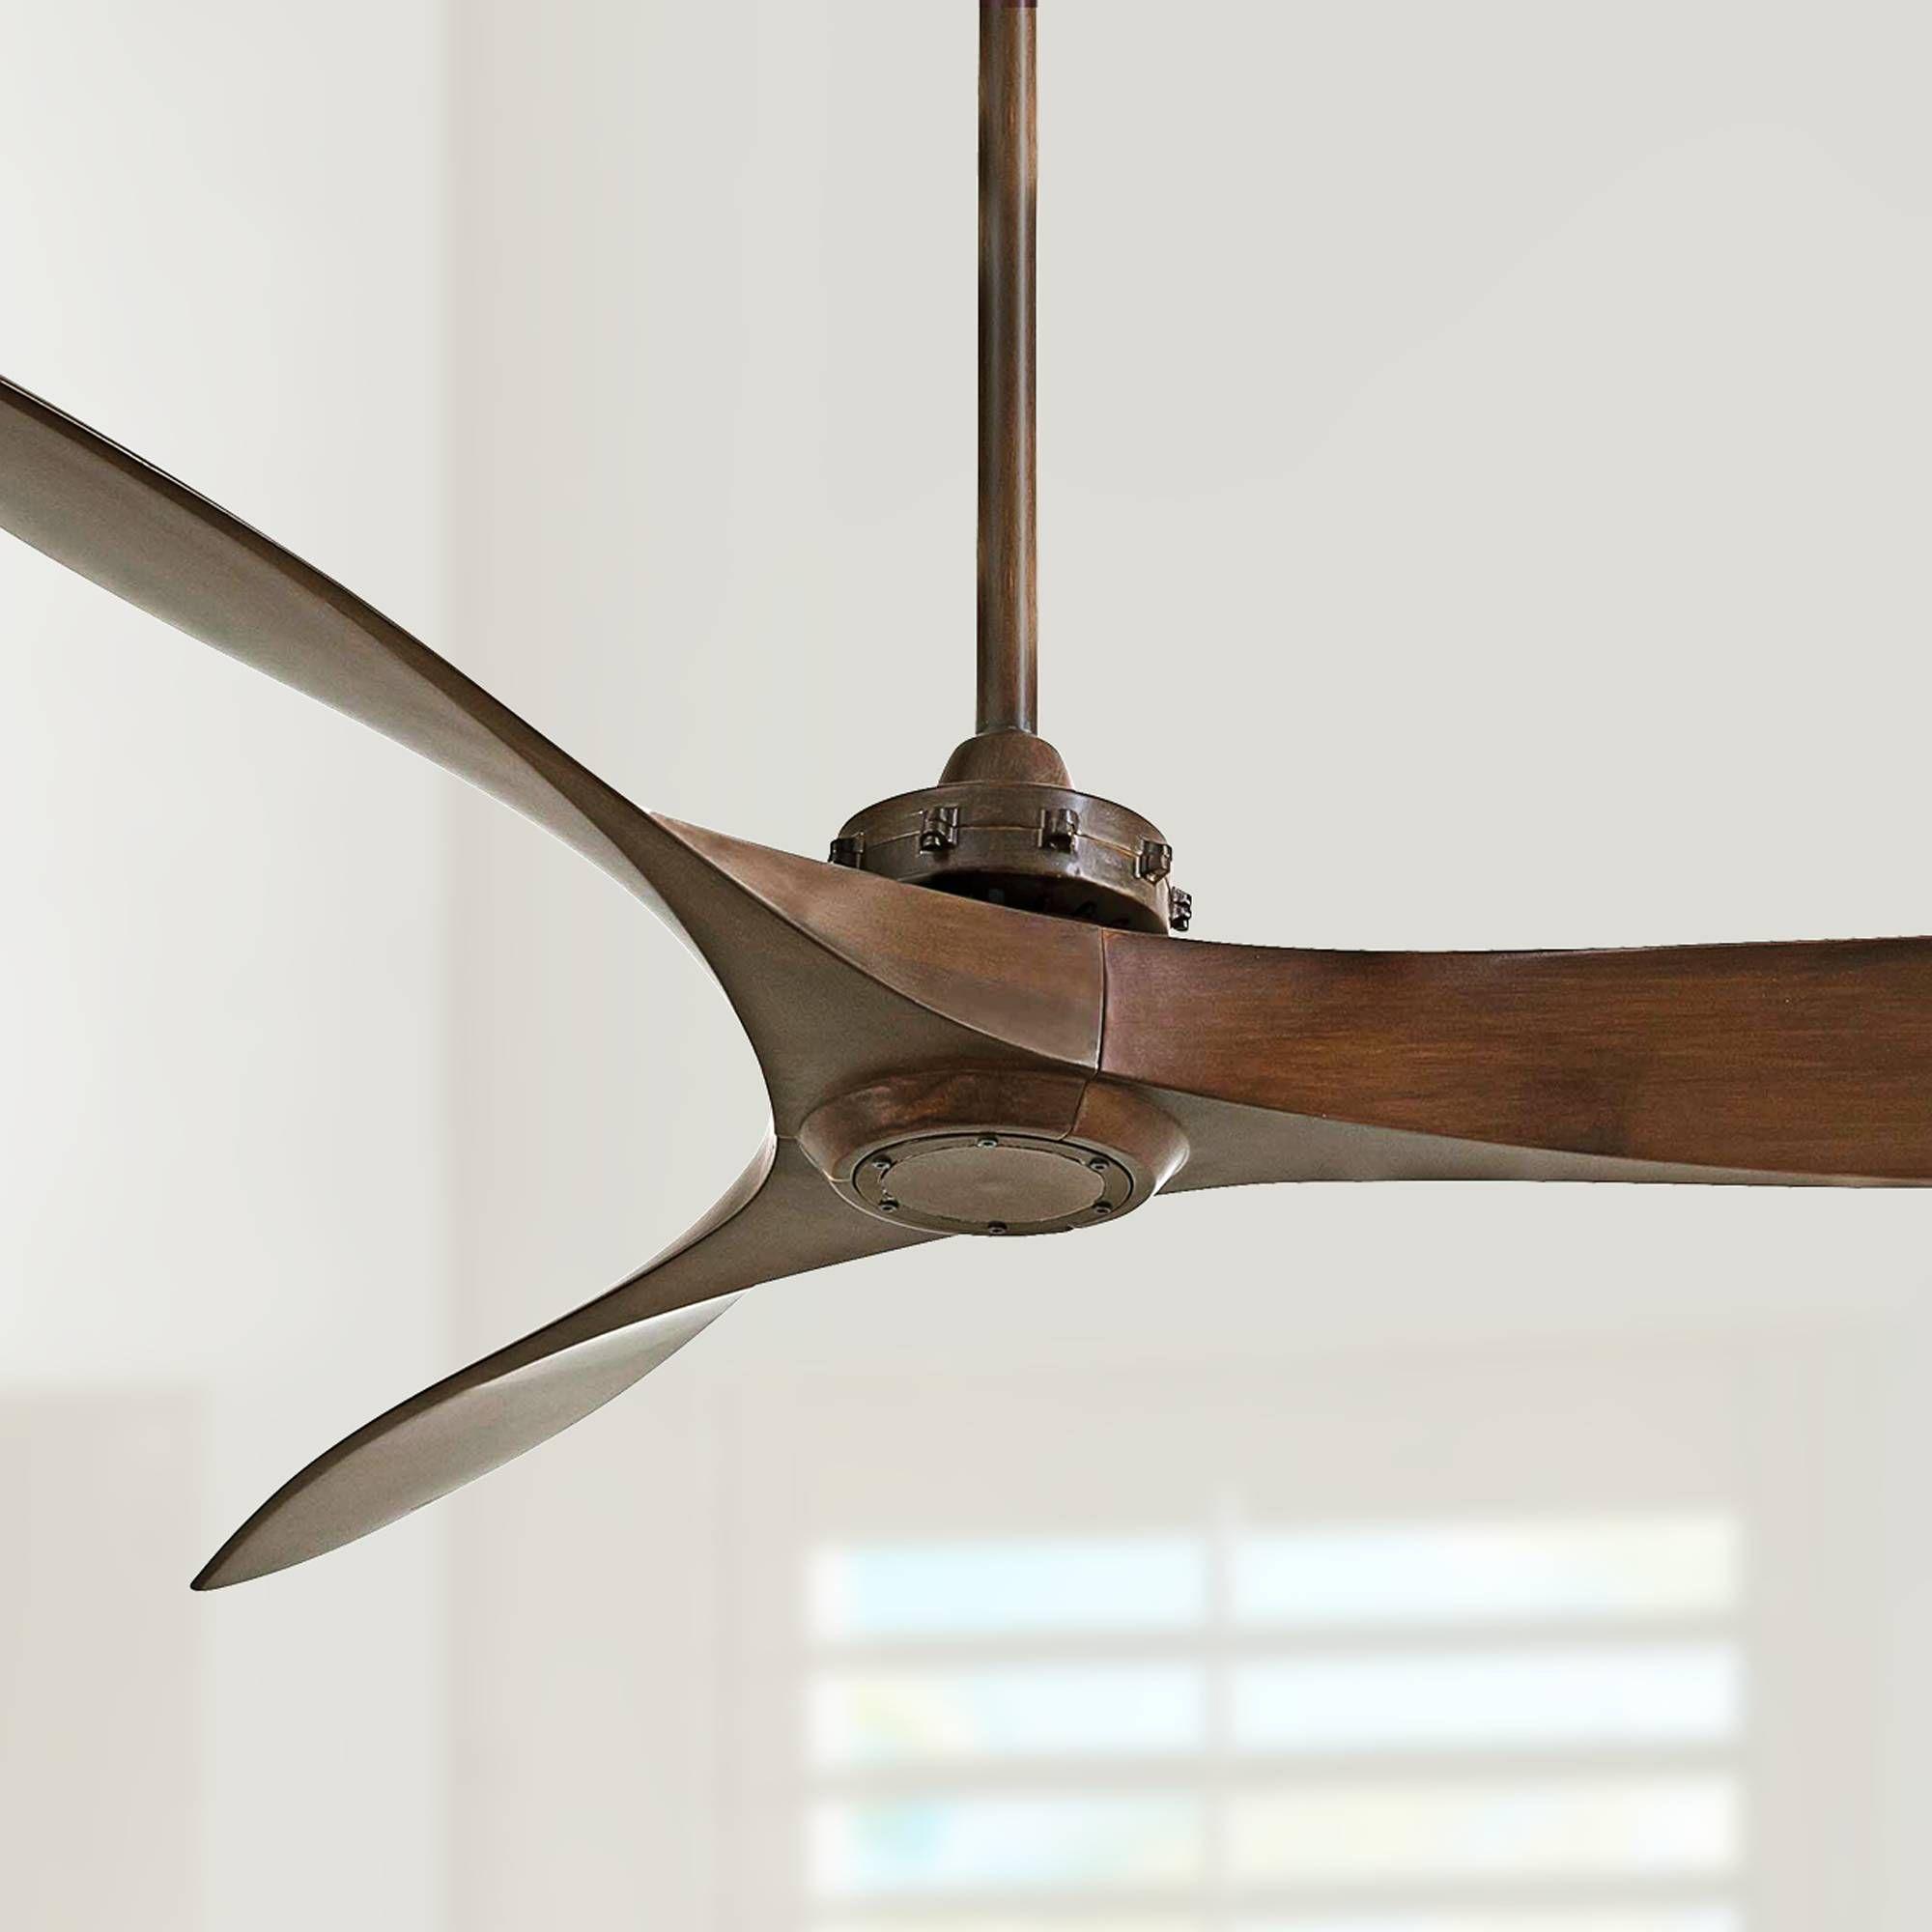 60 Minka Aire Aviation Rosewood Ceiling Fan 2t030 Lamps Plus Ceiling Fan Ceiling Fans Without Lights Ceiling Fan Makeover